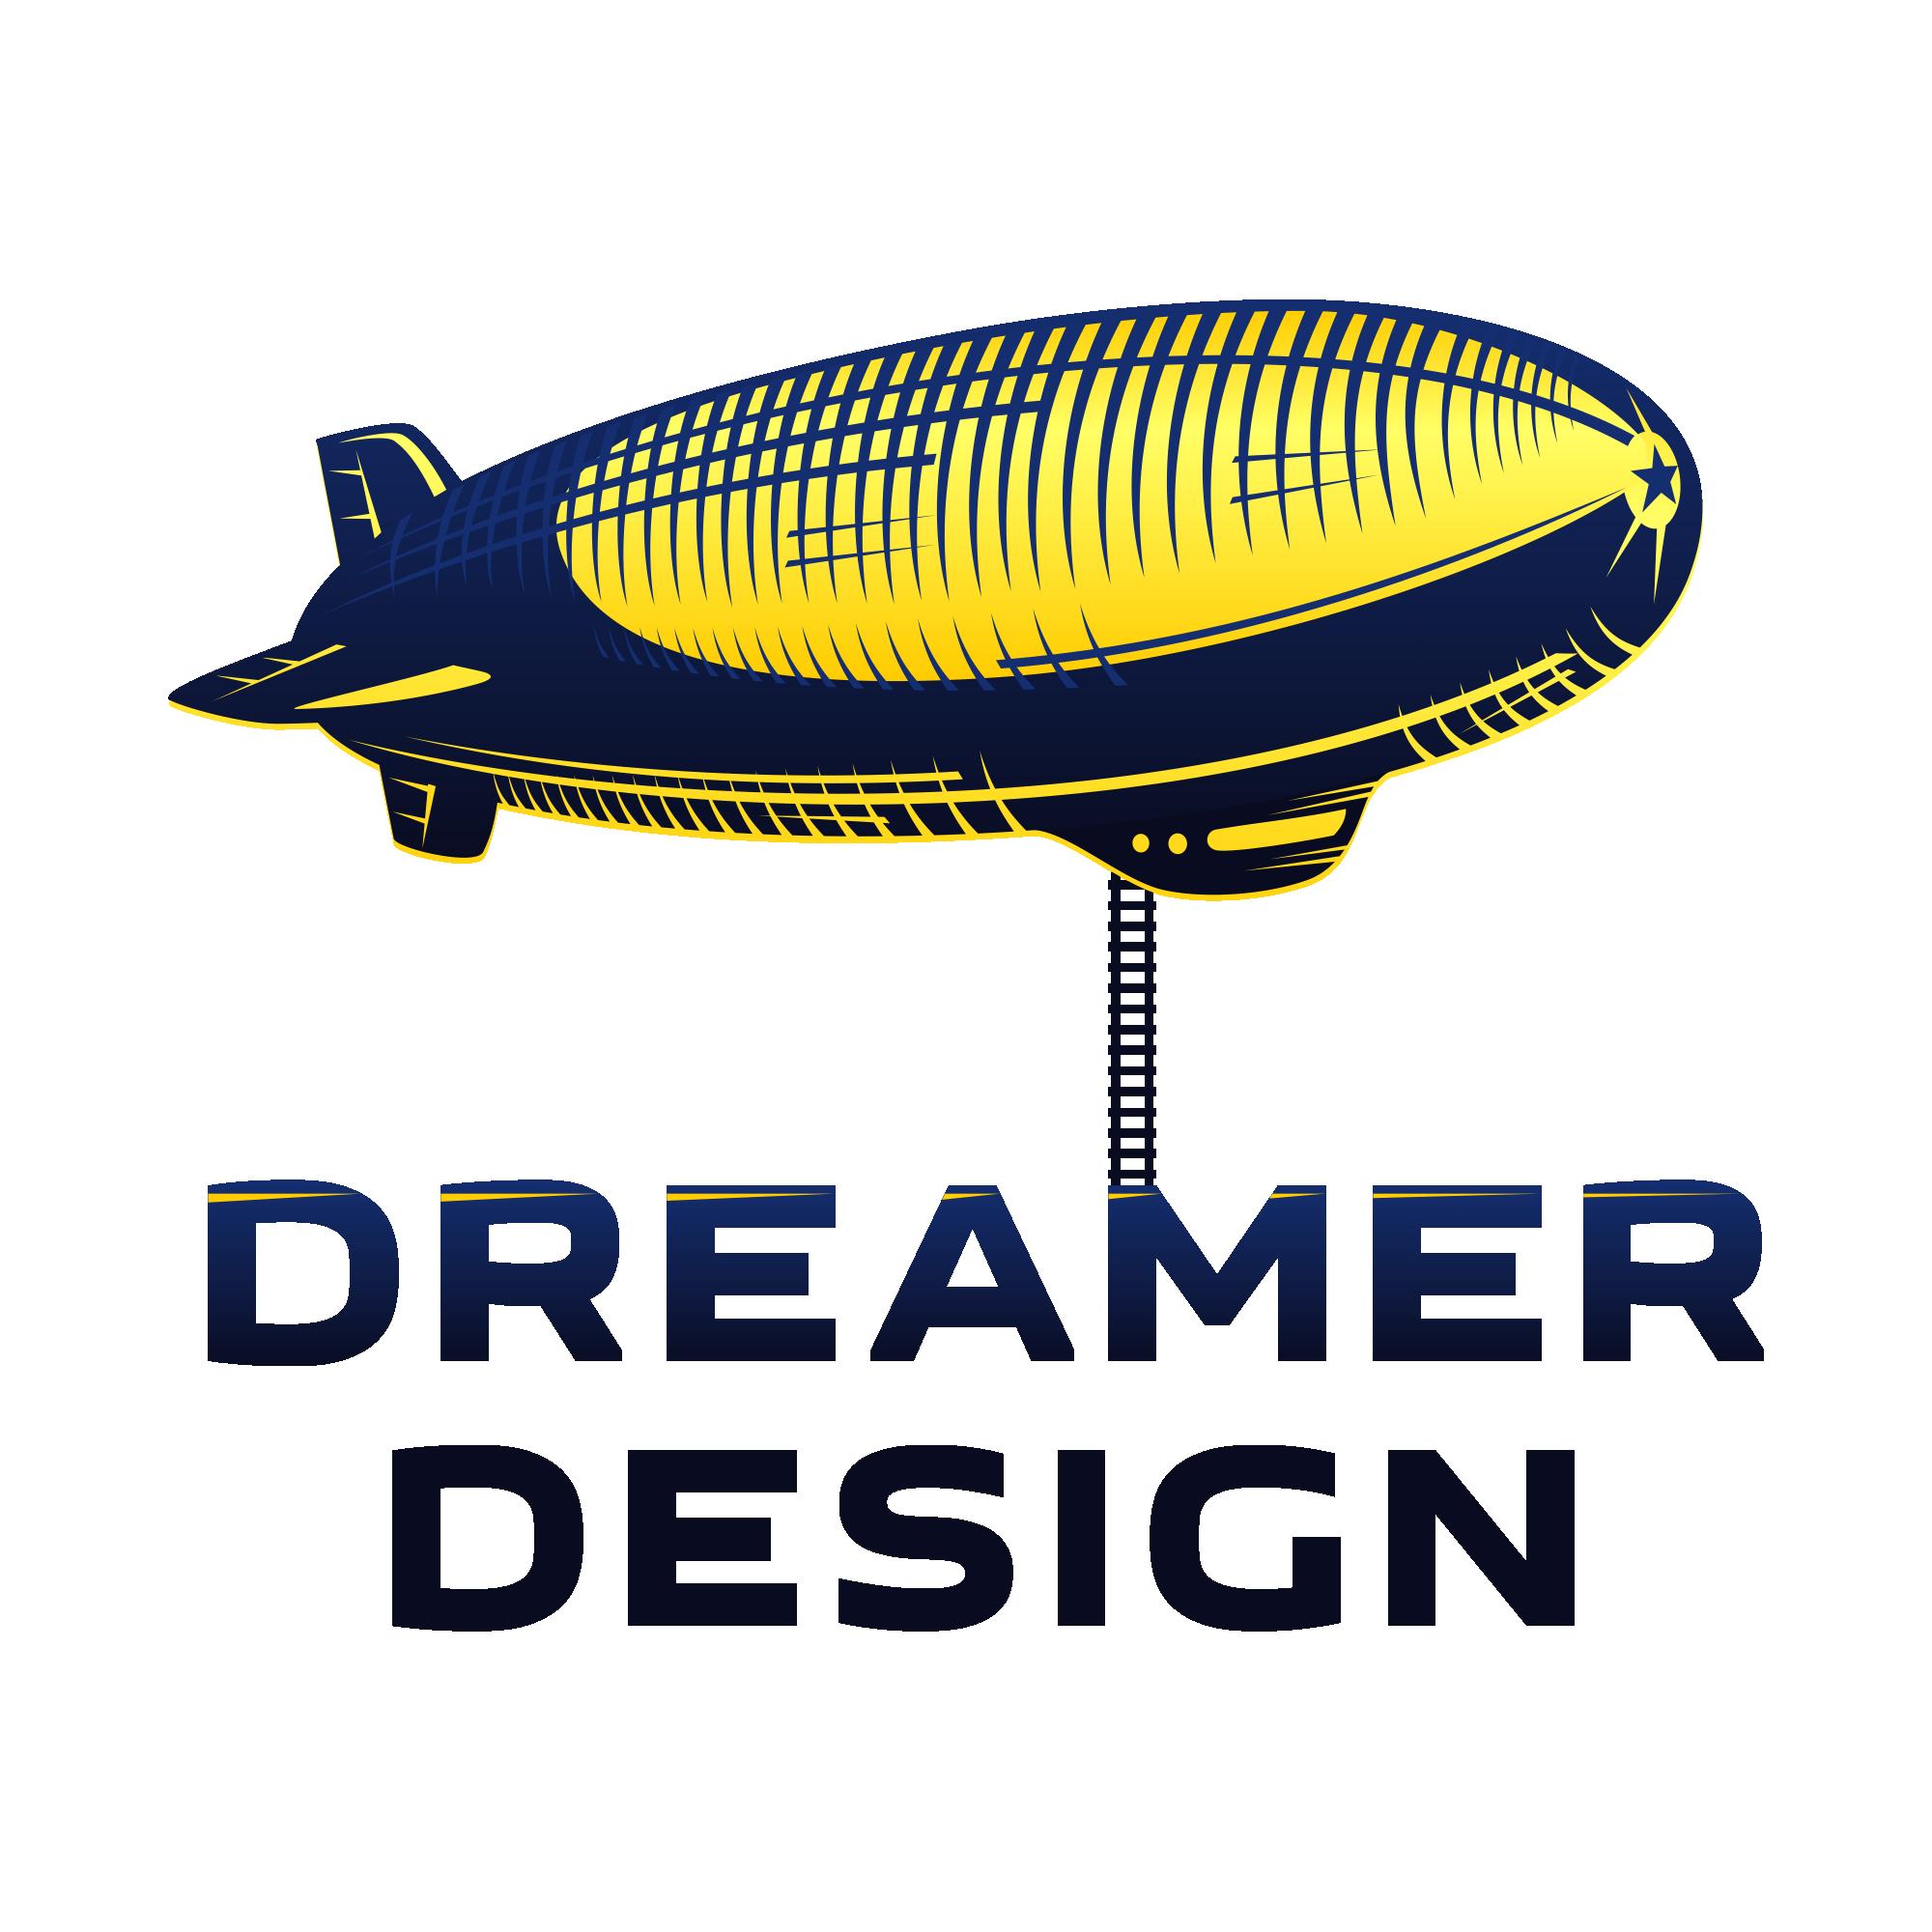 Create logo for new, innovative website design company, Dreamer Design!